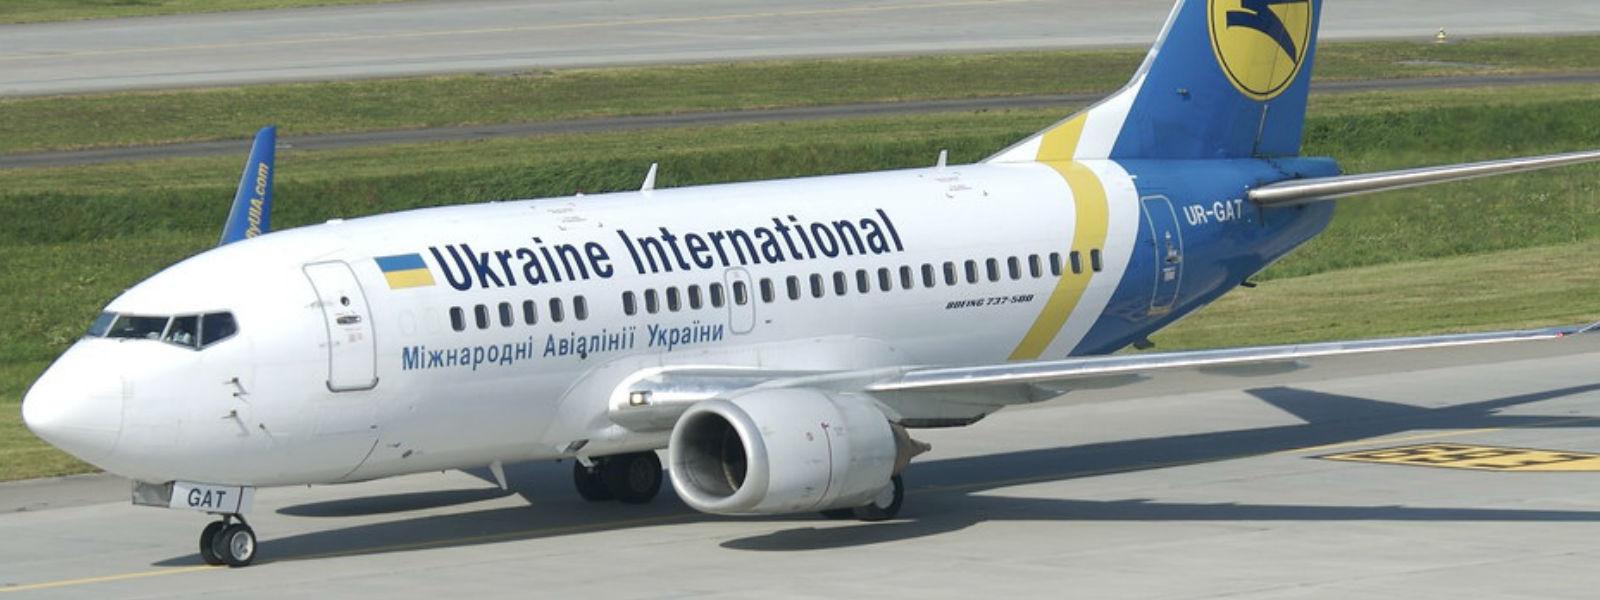 Plane crash in Iran :  Ukraine International Airlines with 180 aboard crashes